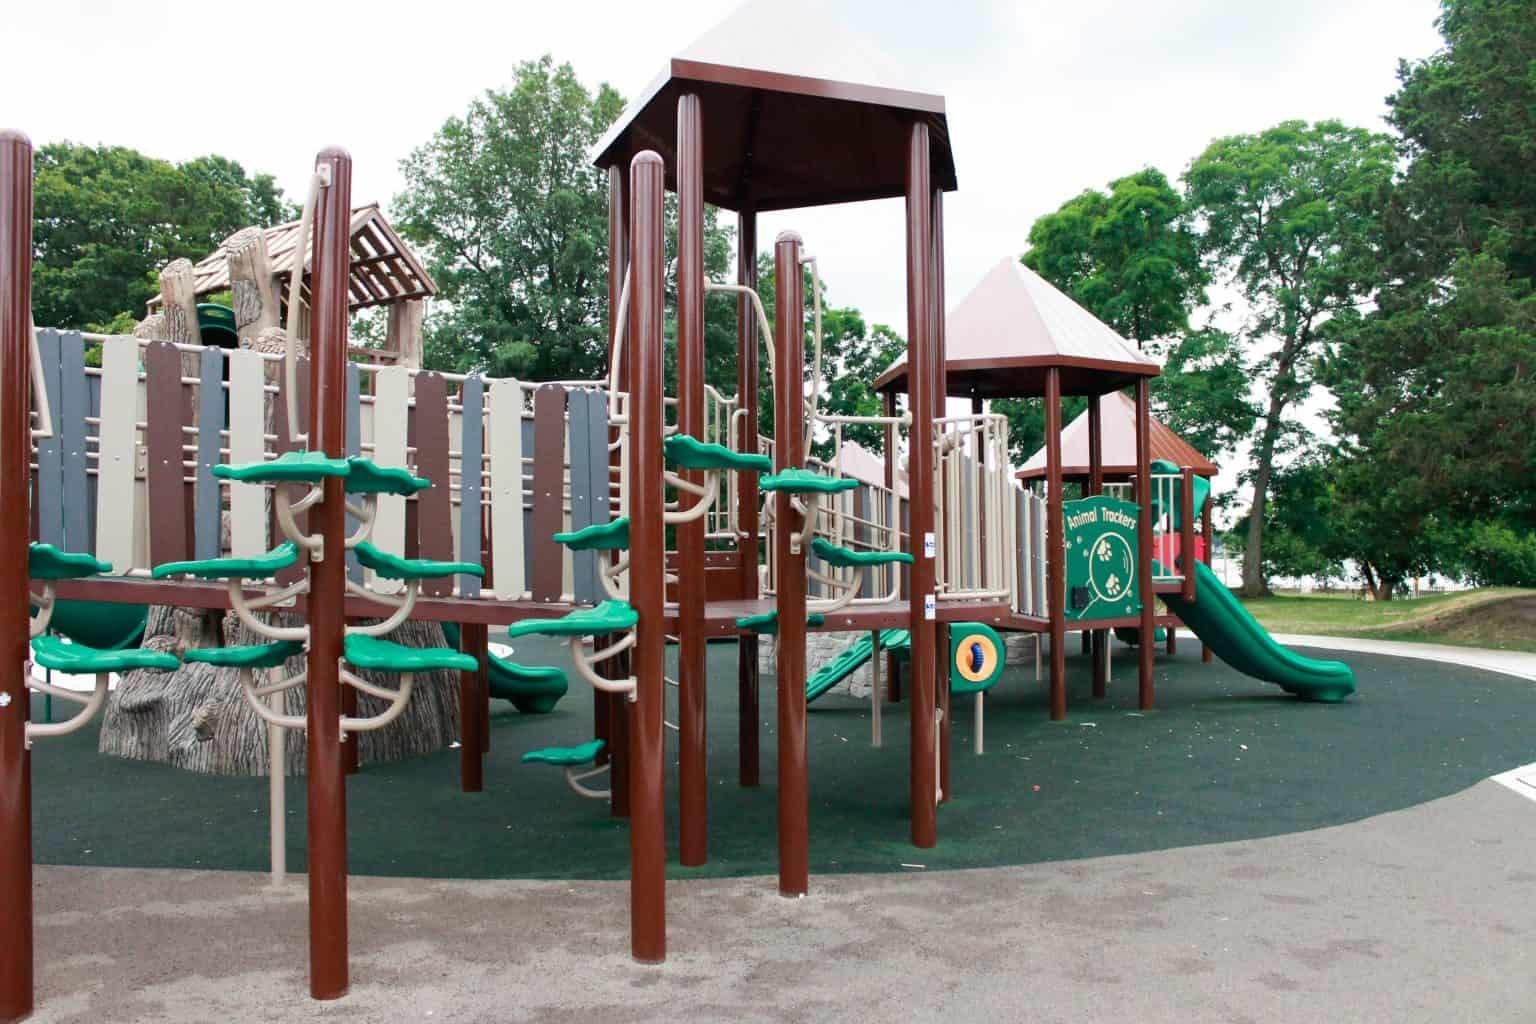 windward-beach-park-playground-brick-nj_28266703805_o-1536x1024